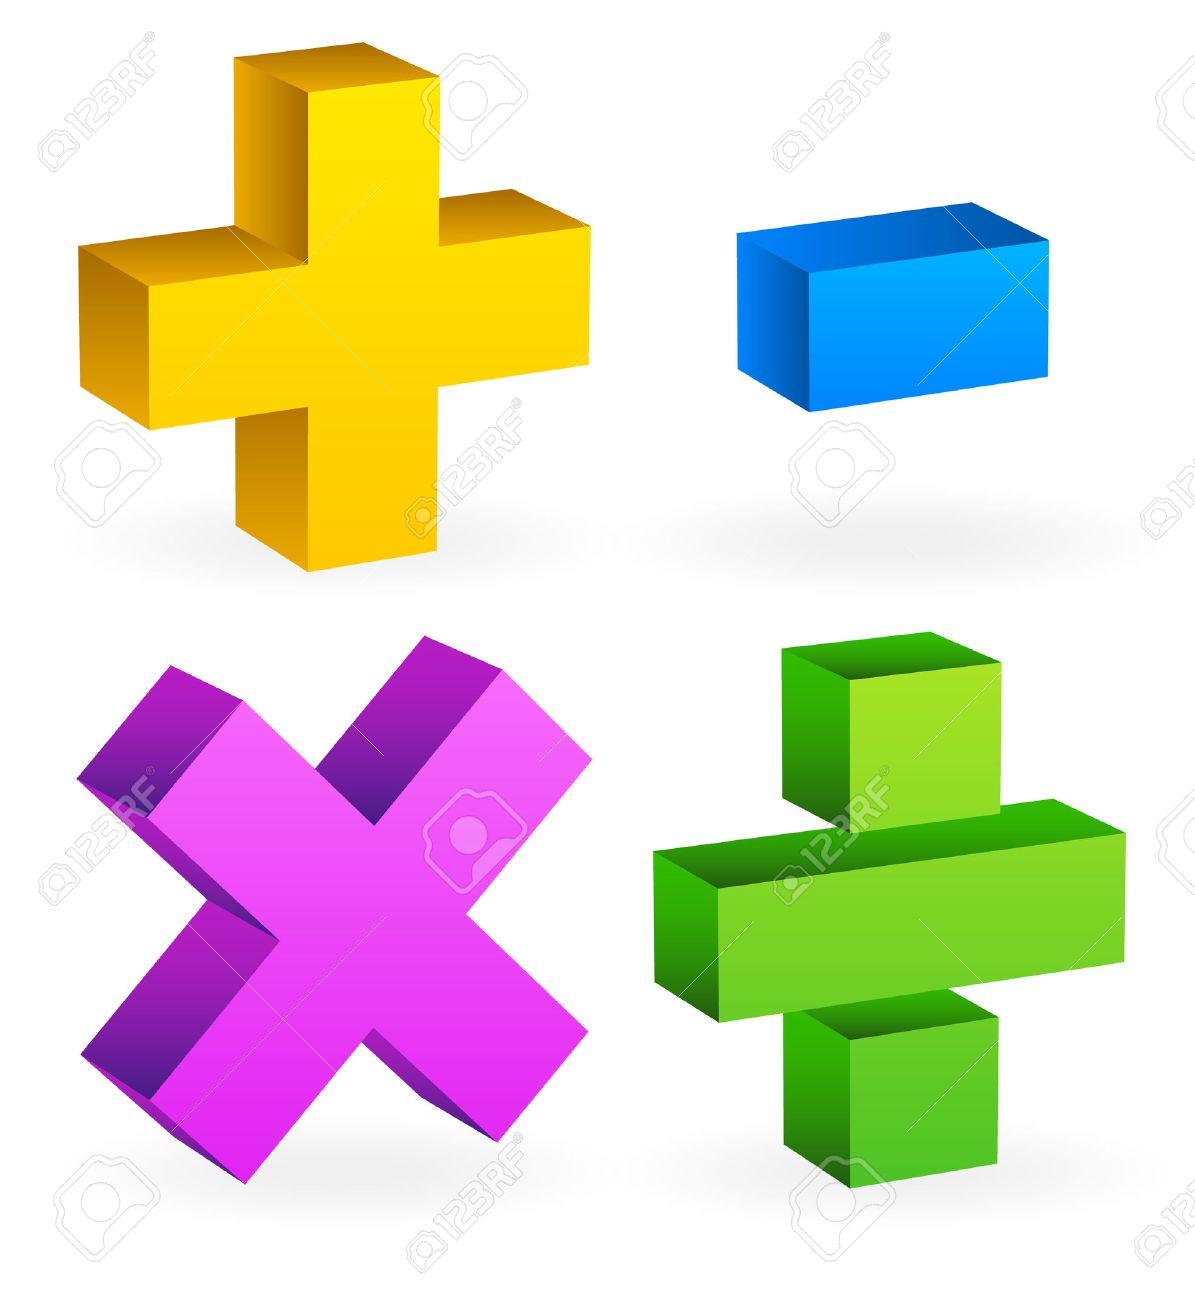 Math Symbole Mathmatique De Calcul Le Concept De La Calculatrice